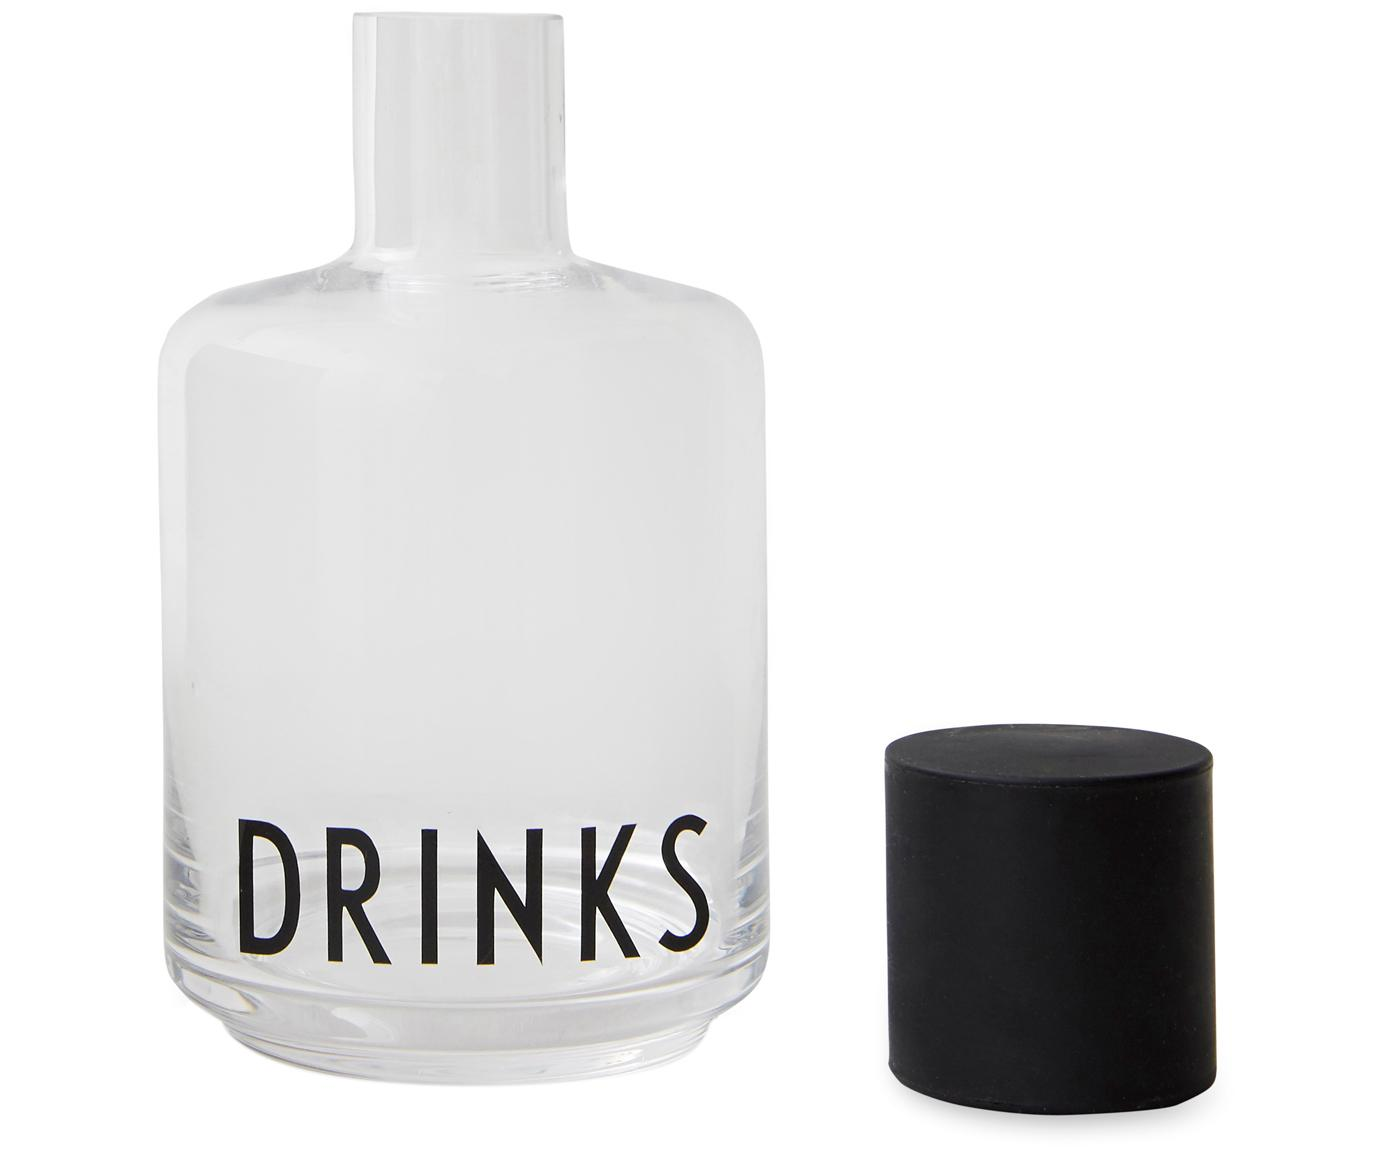 Karaffe Drinks, Deckel: Silikon, Transparent, Schwarz, 500 ml